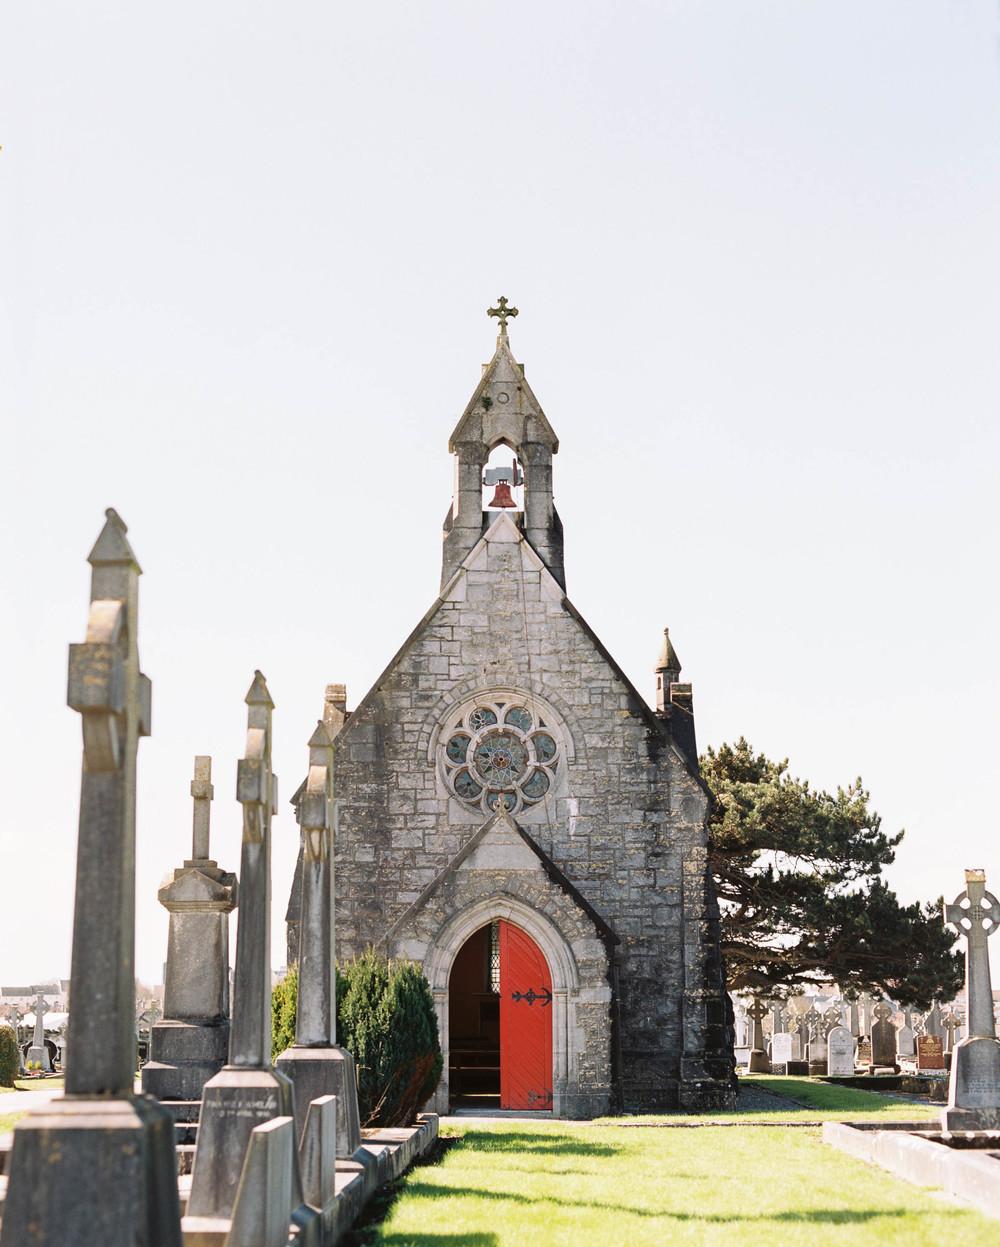 Alyssa Joy Photography - Galway, Ireland travel photographer